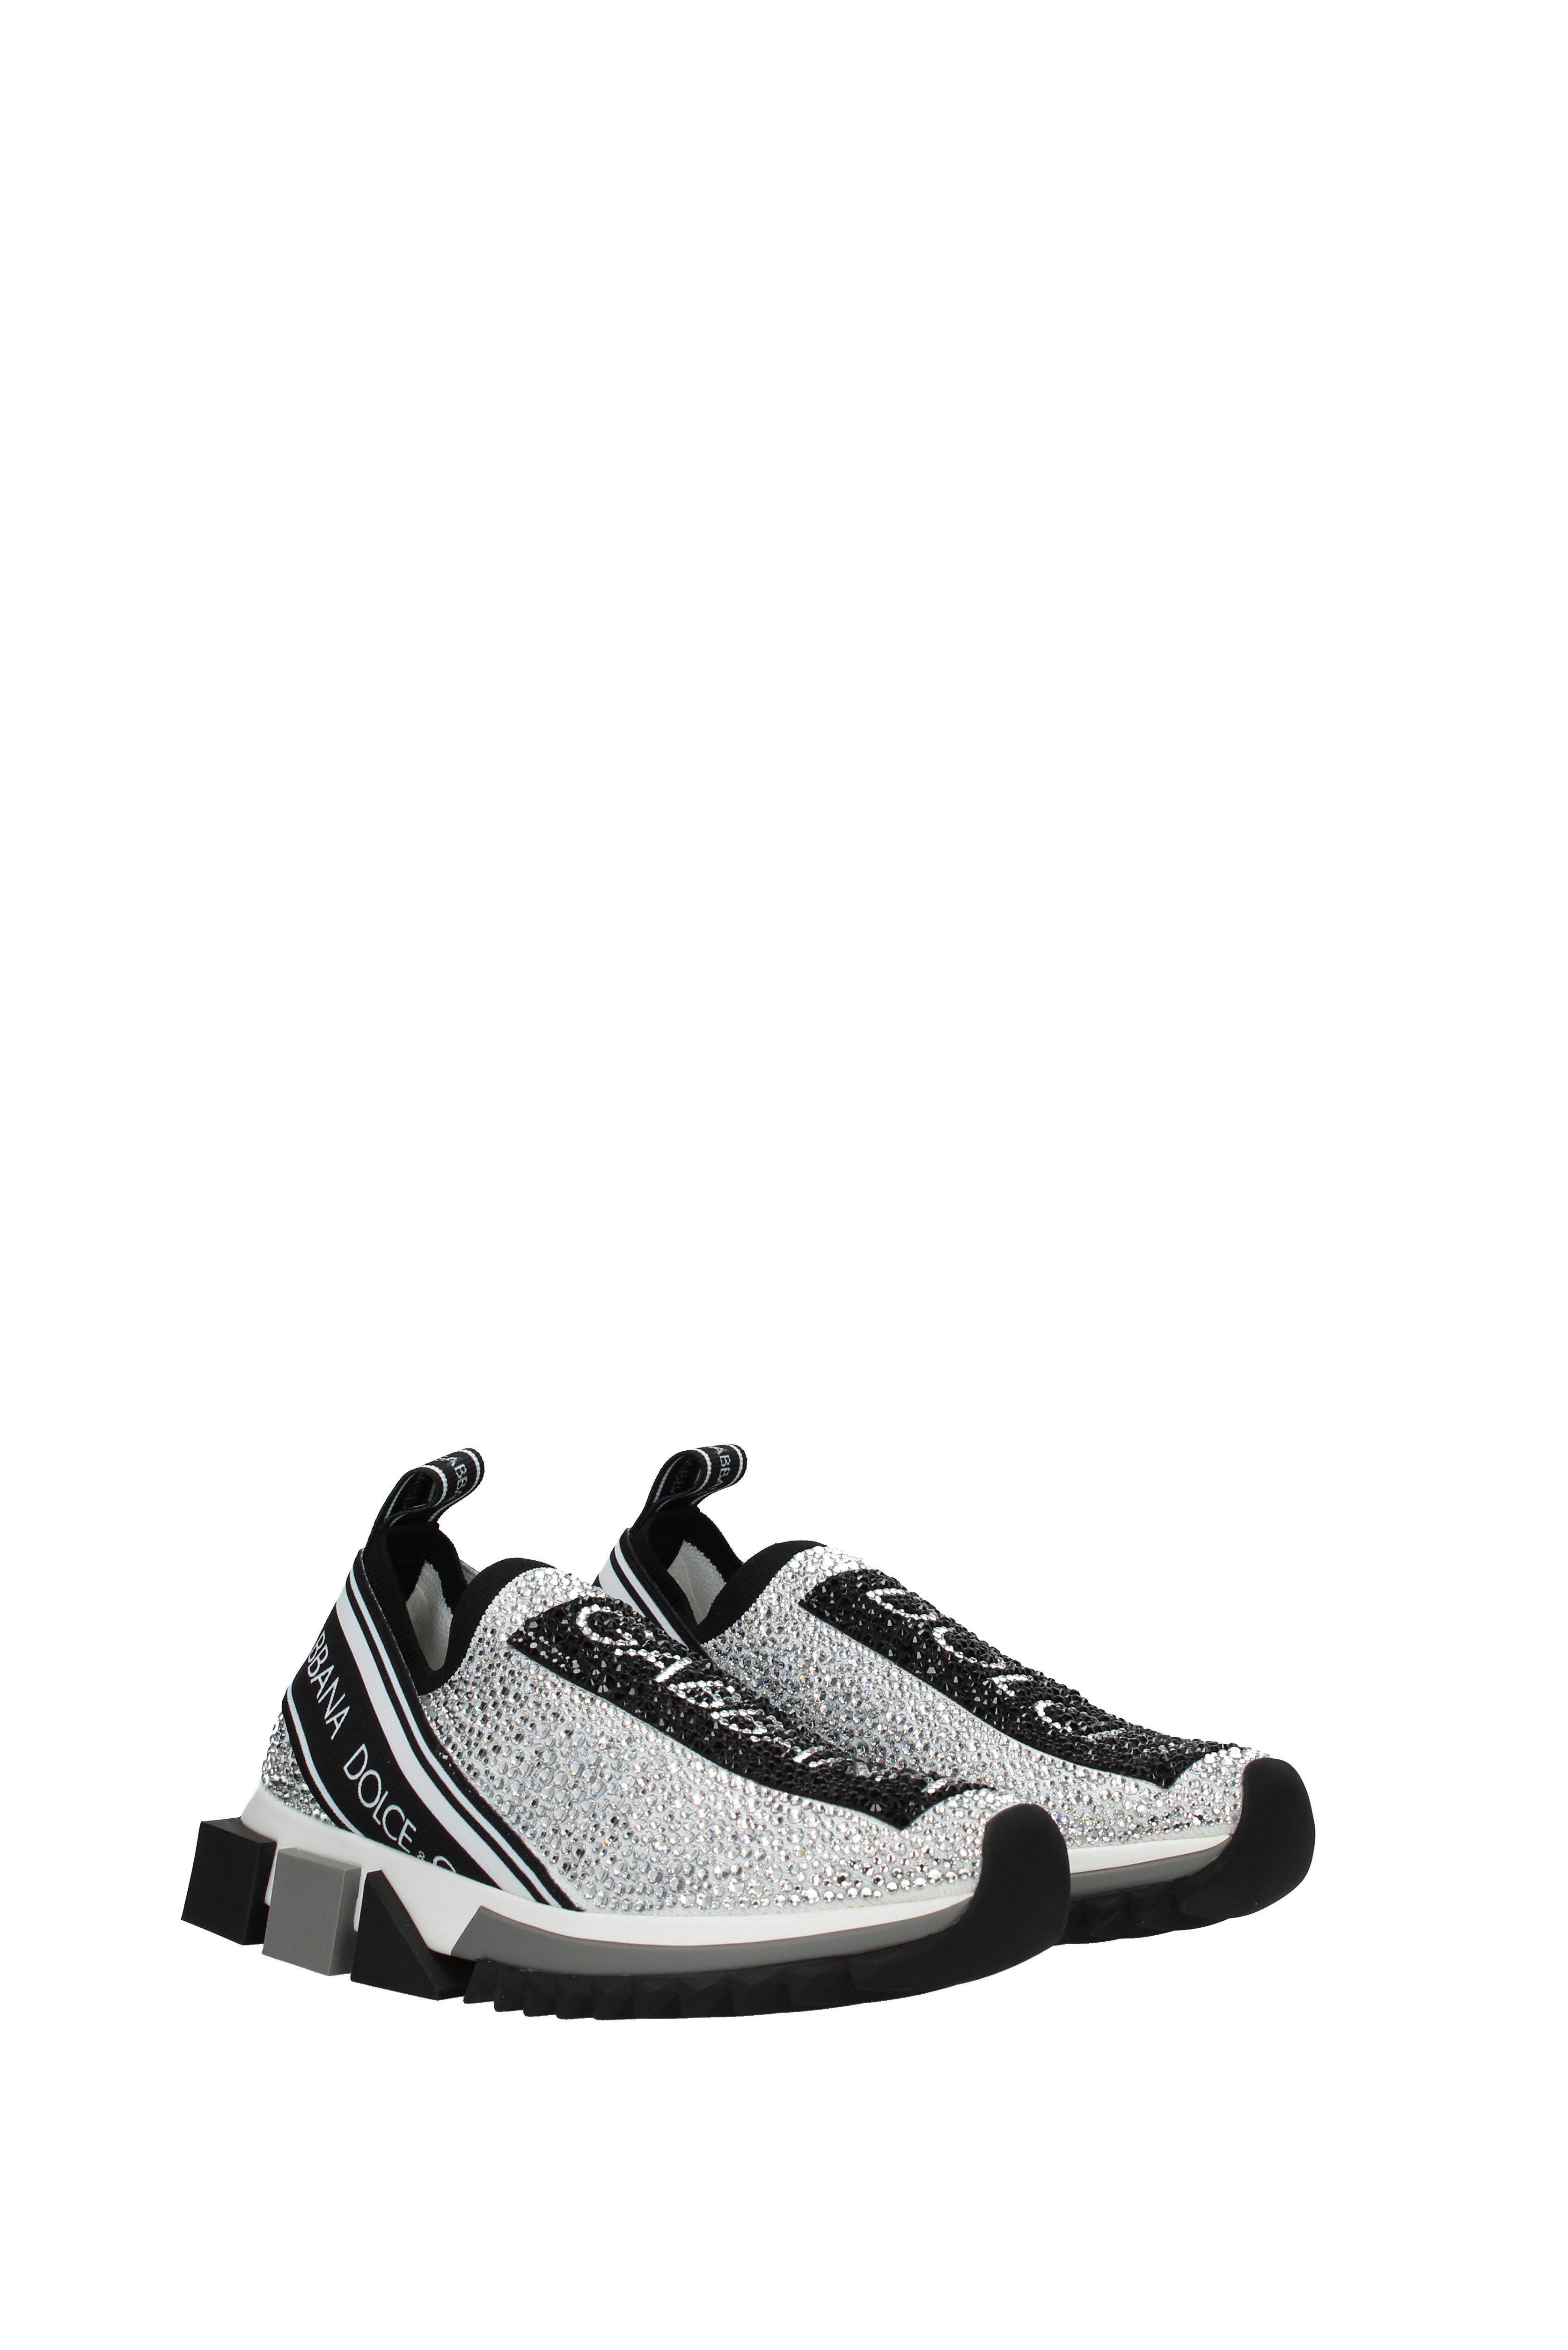 31420df51 Dolce & Gabbana - Black Sneakers Sorrento Women Silver - Lyst. View  fullscreen